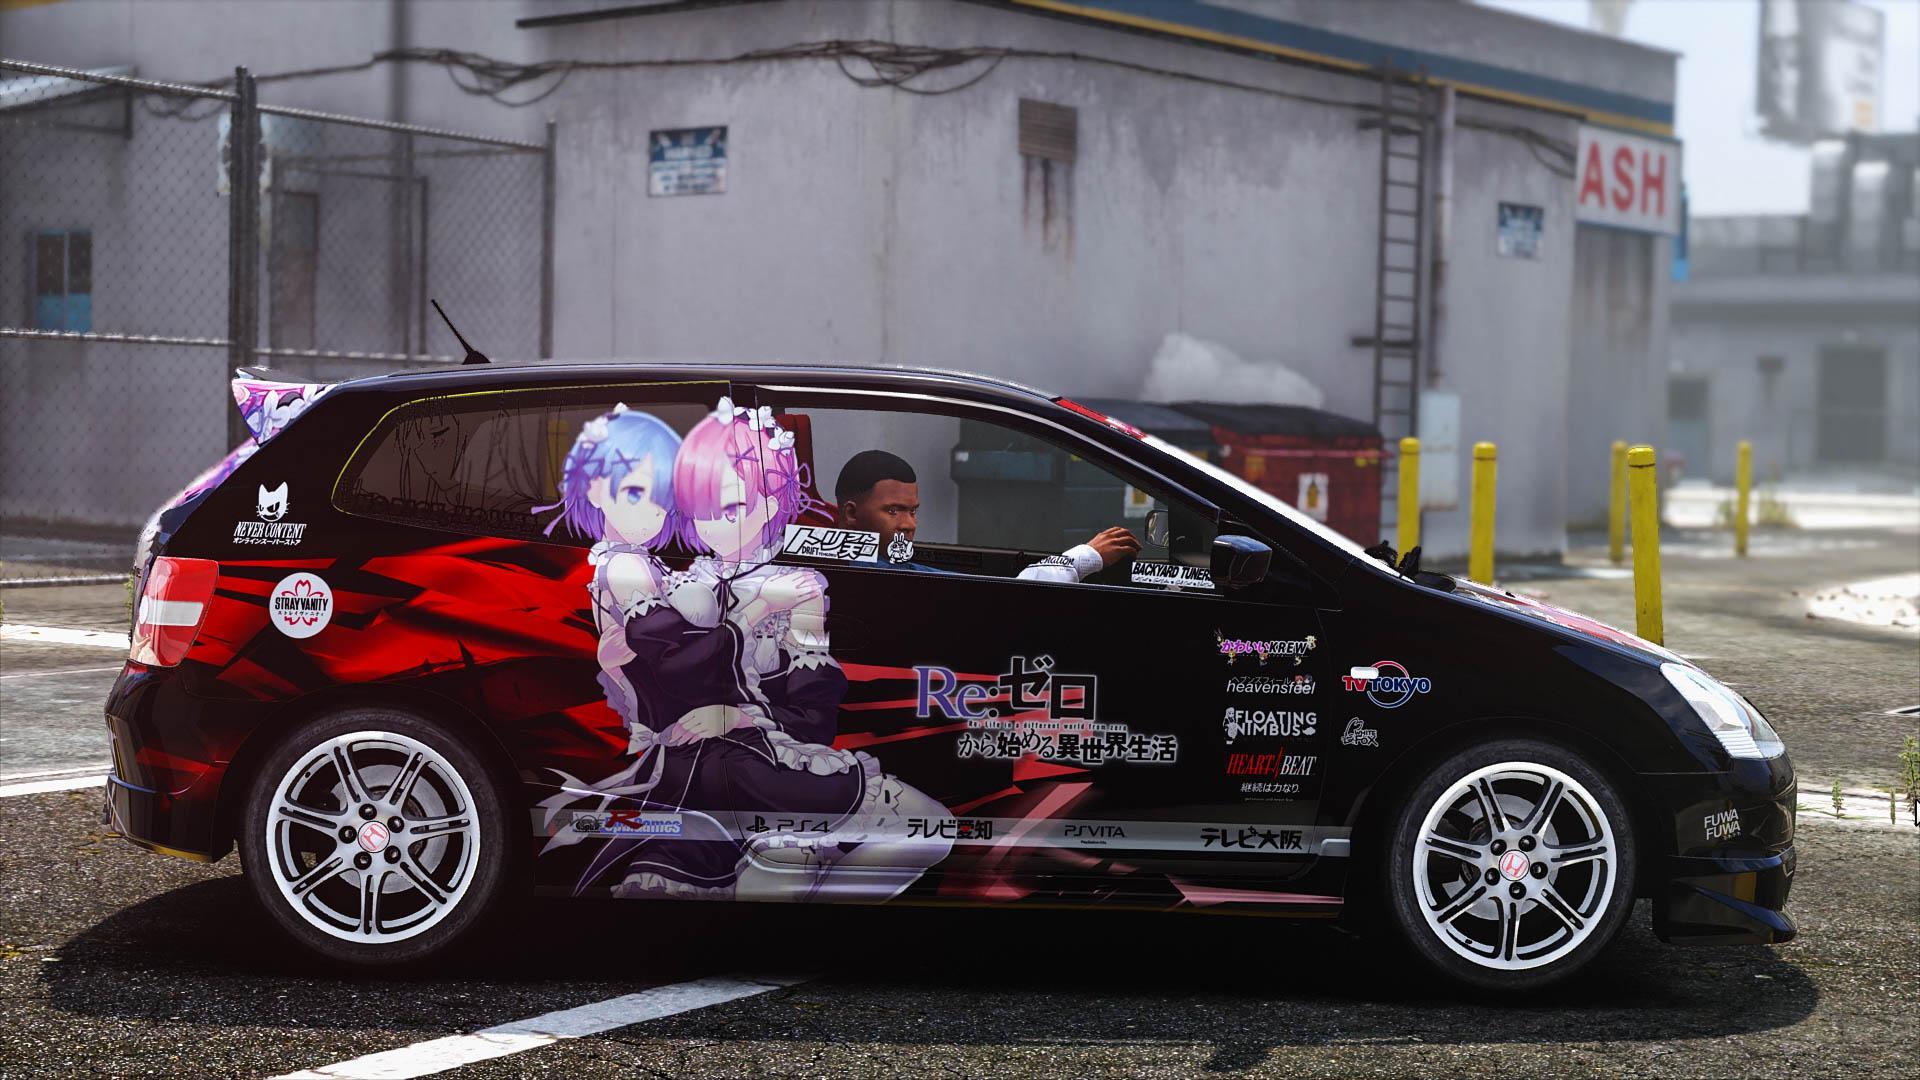 Fate Zero Wallpaper Hd Rezero Civic Ep3 Itasha Gta5 Mods Com